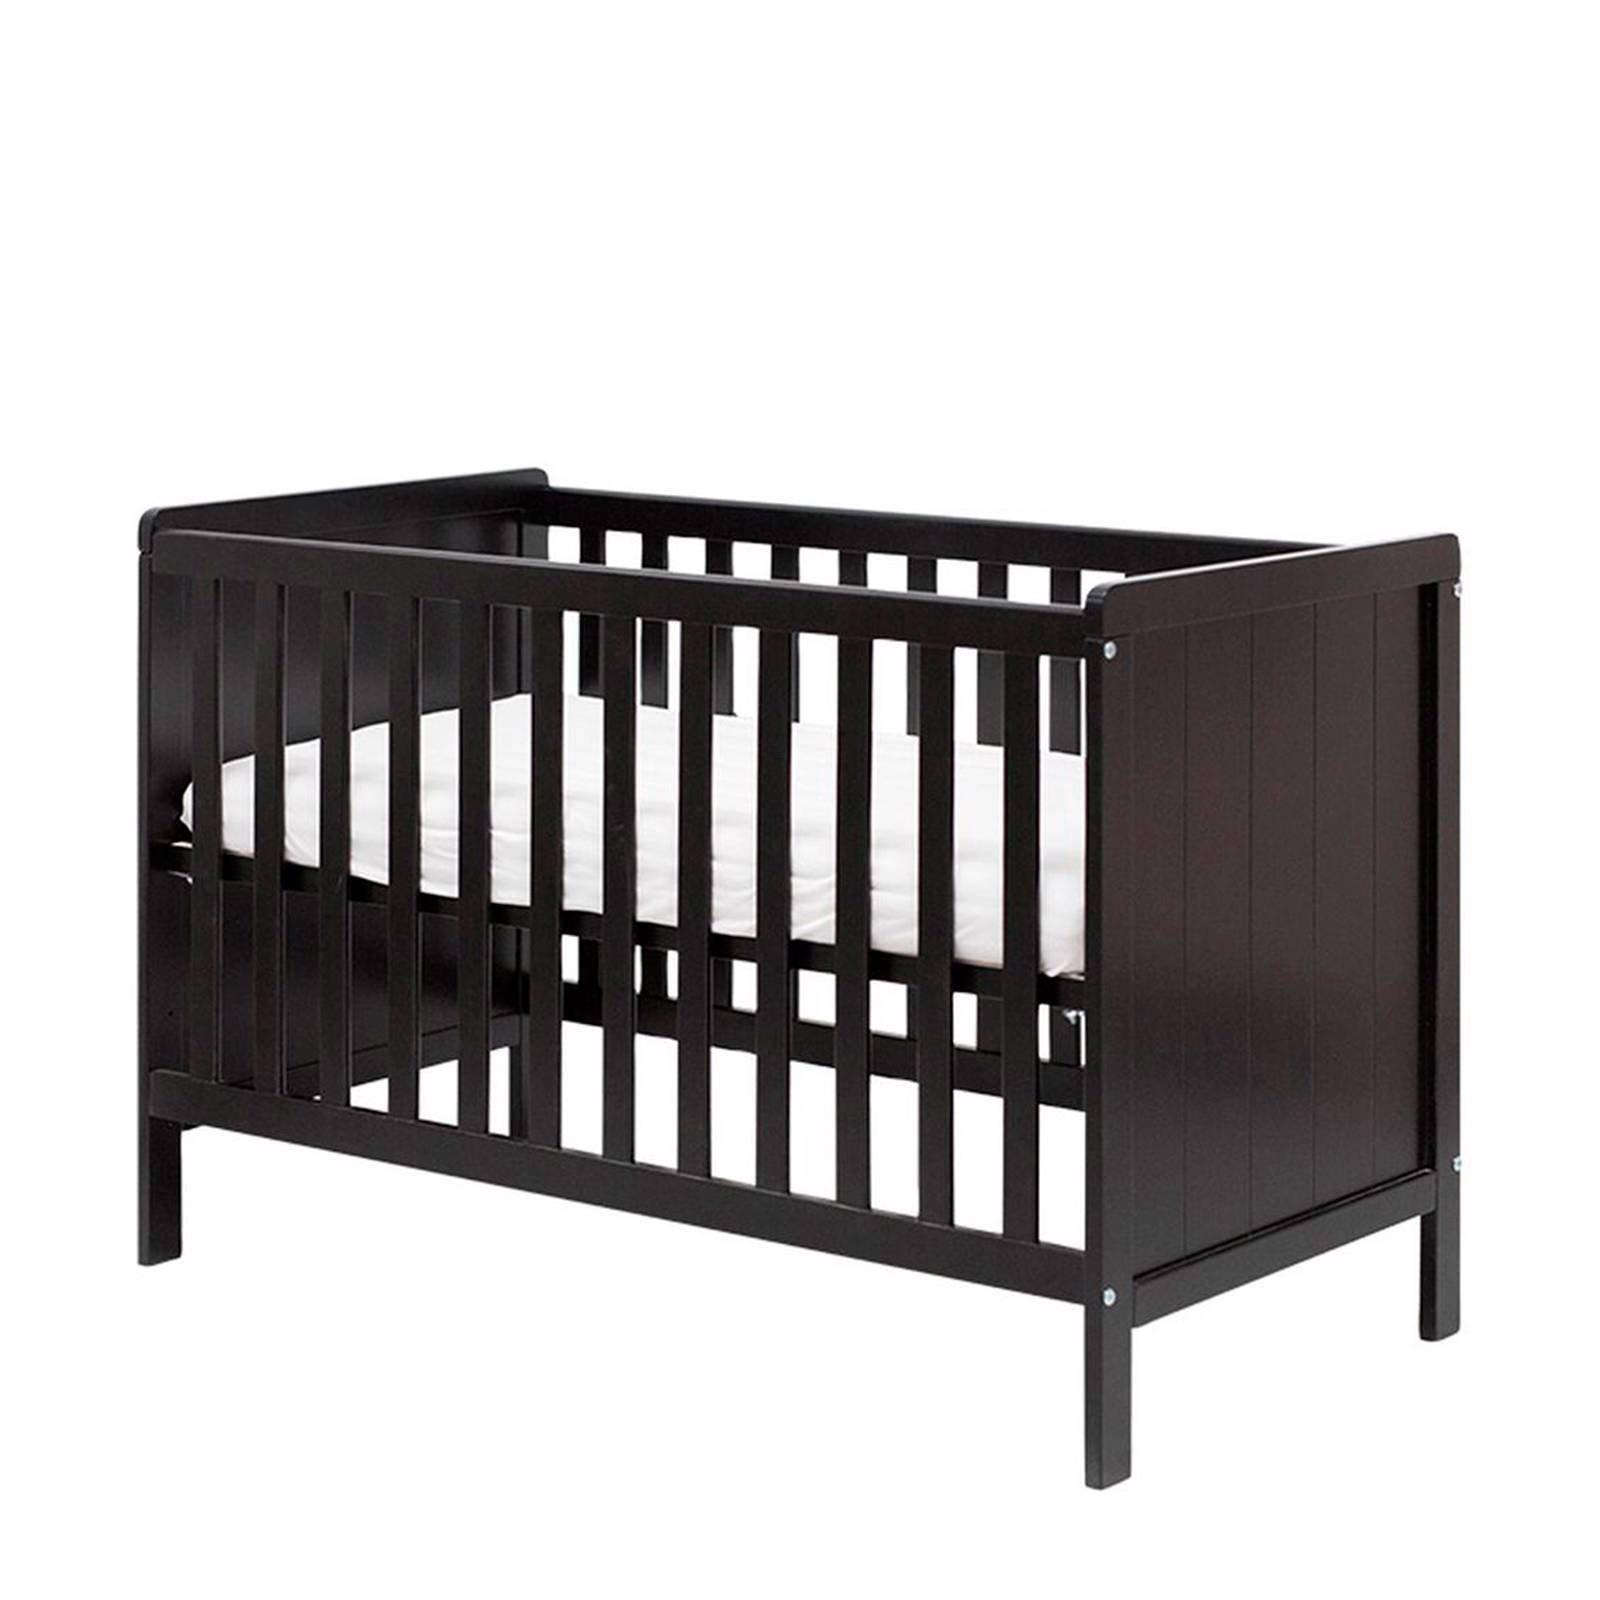 Zwart Ledikant Baby.Basicline Ralph Ledikant 60x120 Cm Zwart Wehkamp